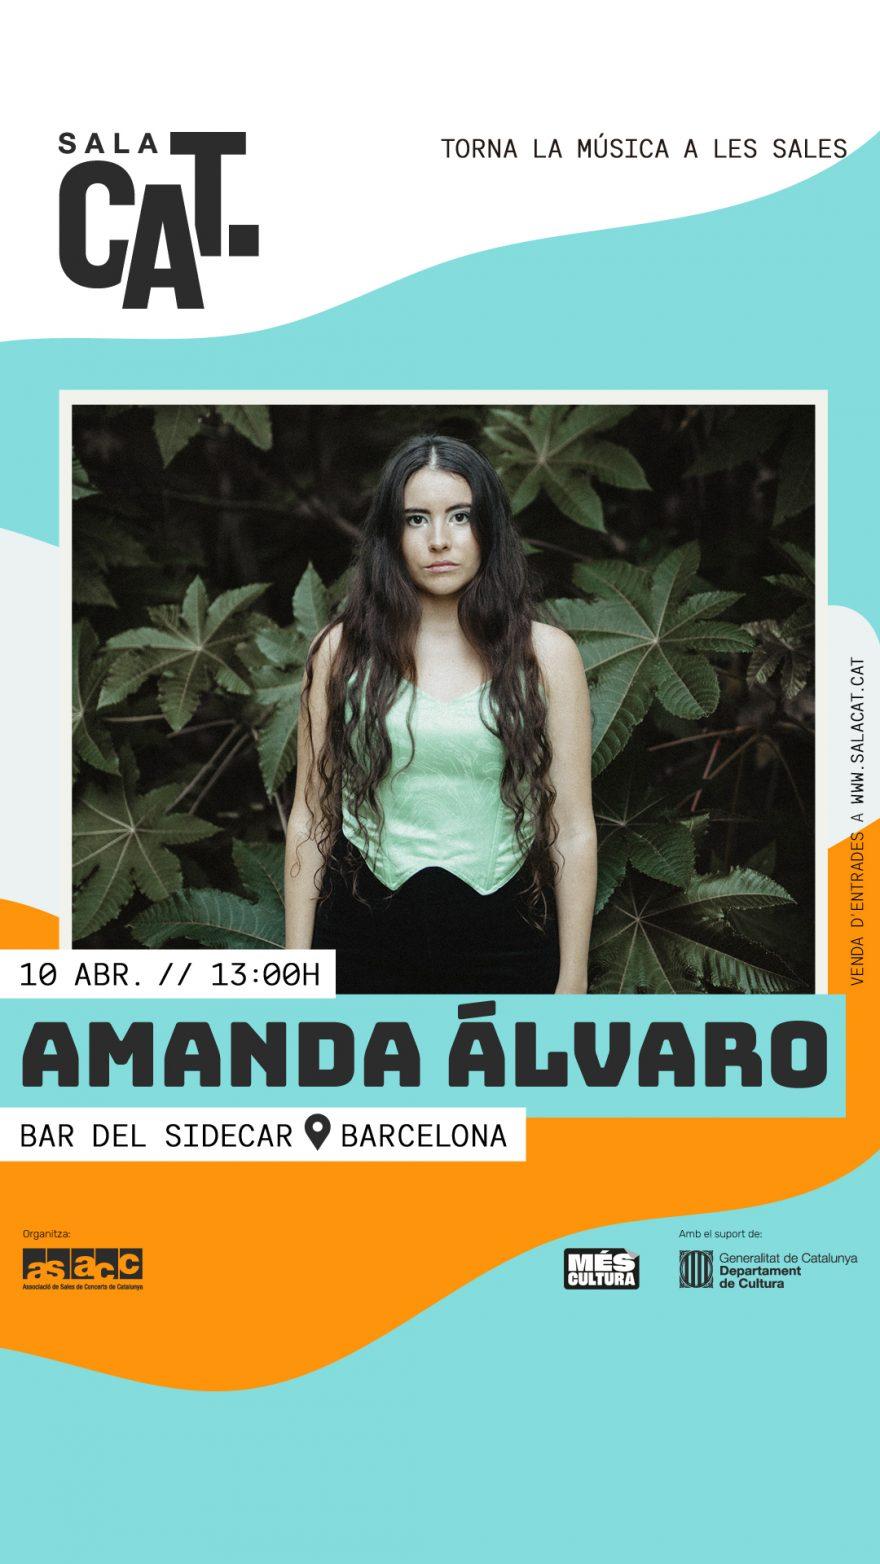 Amanda Álvaro a Sidecar